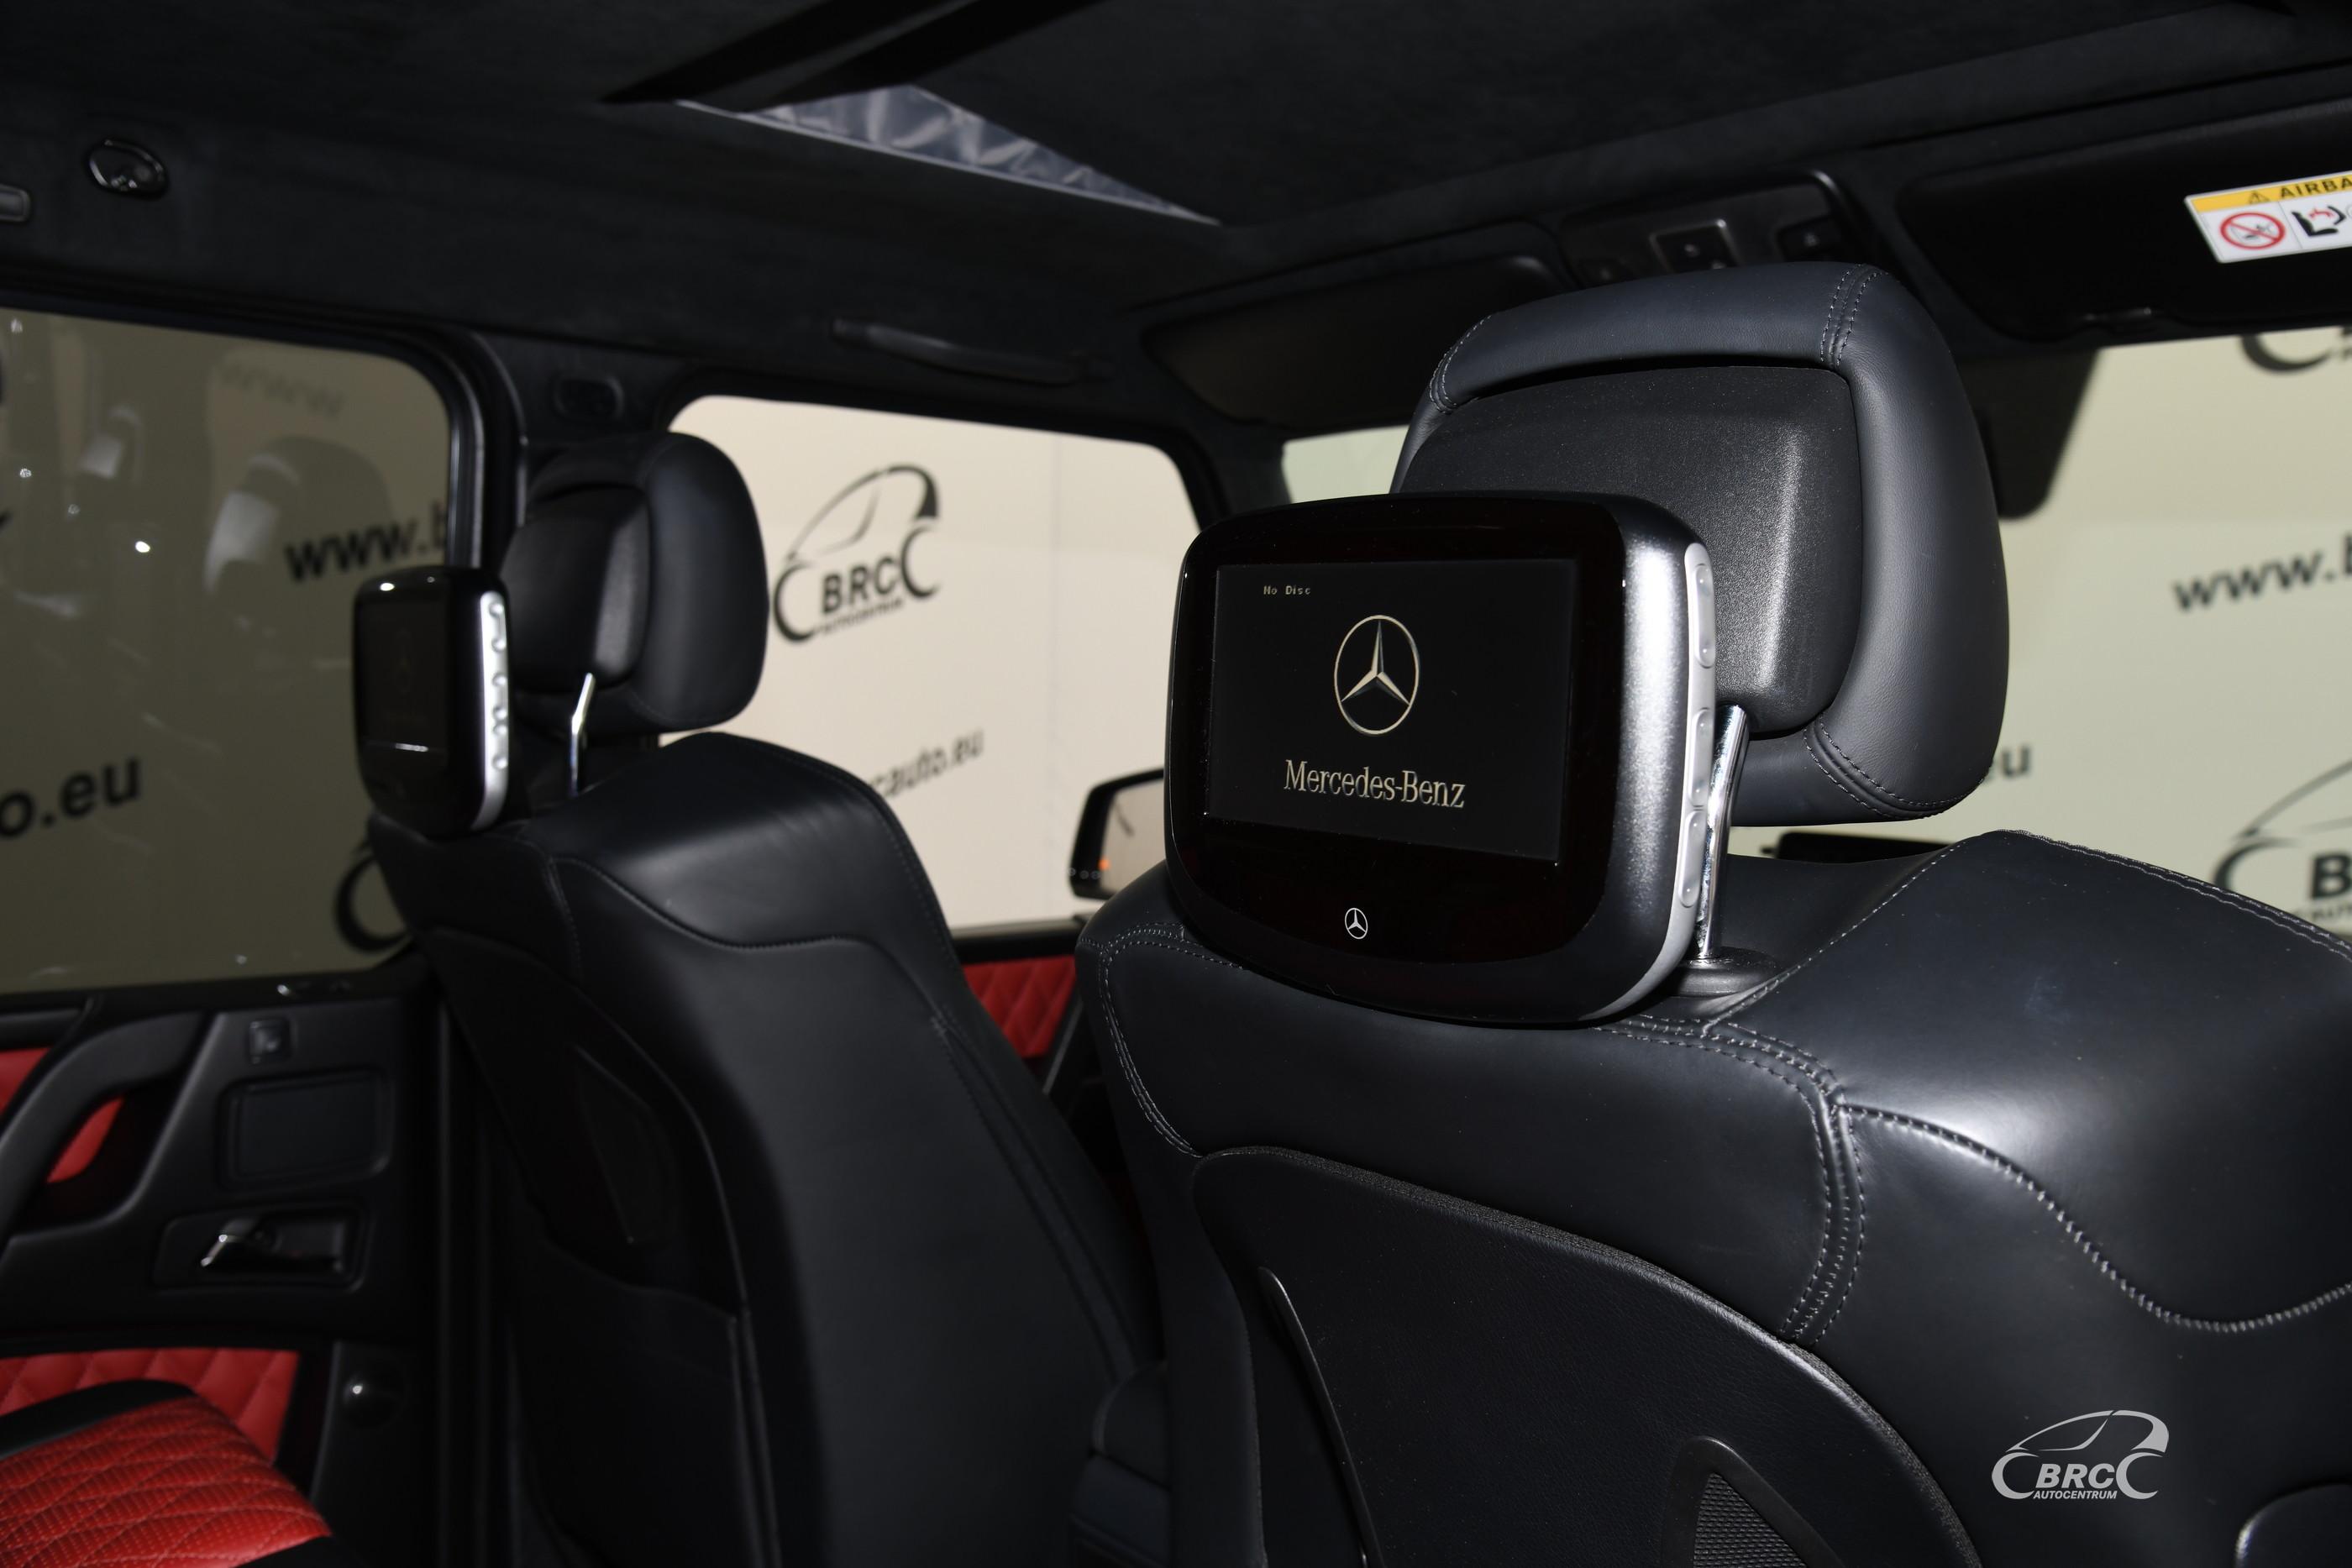 Mercedes-Benz G 63 AMG Automatas